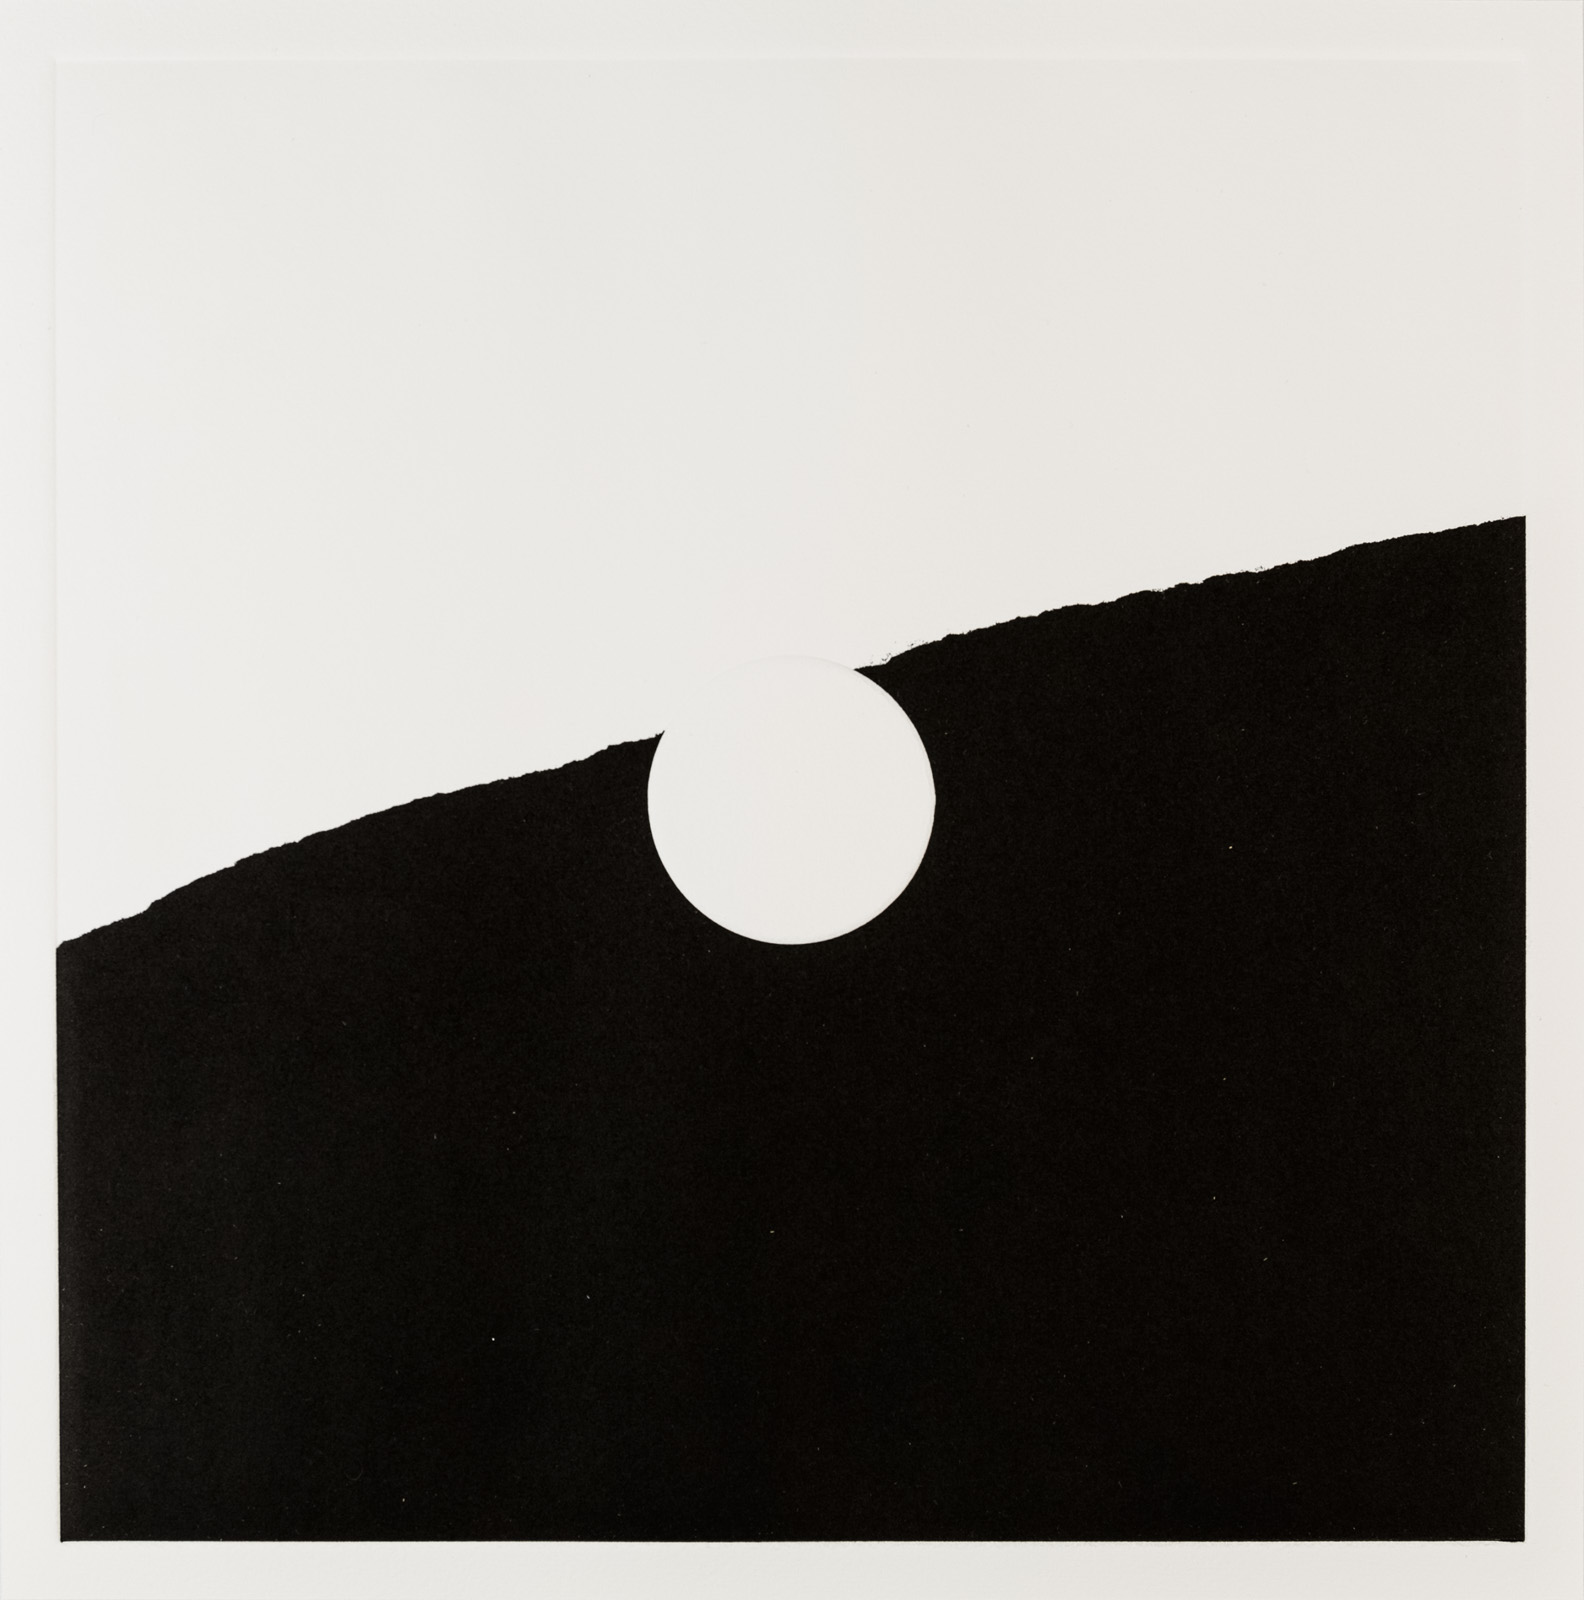 Kristina Matousch, What Lies Ahead 1, 2017, Unique print from an edition of 8, 31,5 x 31,5 cm